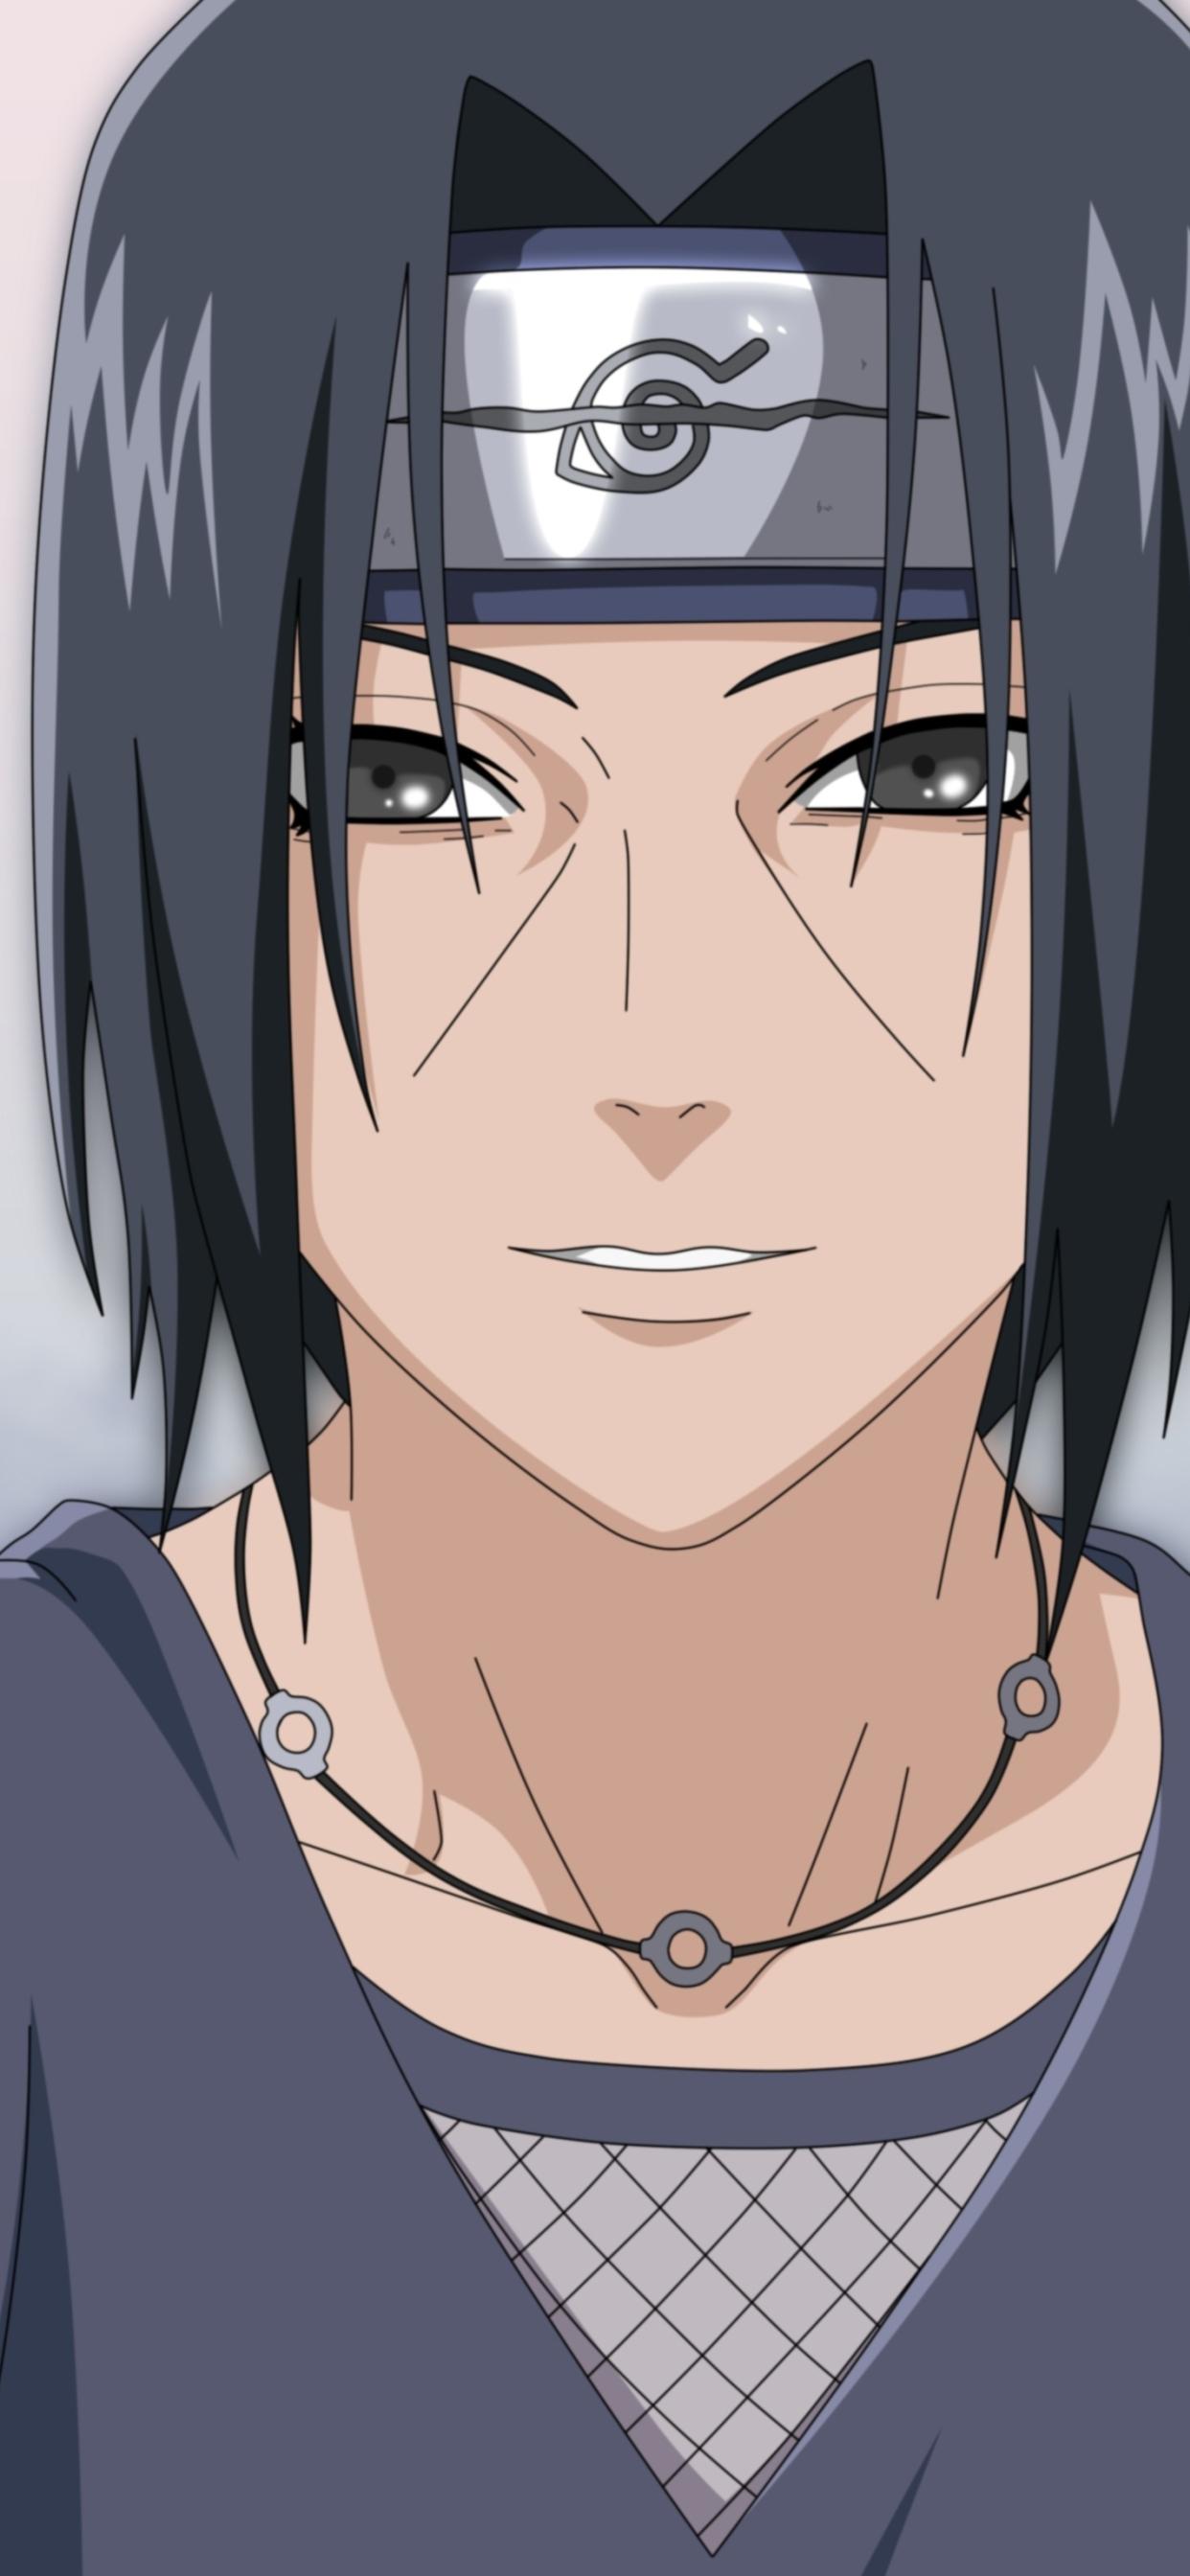 1242x2688 Naruto Itachi Uchiha Nukenin Iphone Xs Max Wallpaper Hd Anime 4k Wallpapers Images Photos And Background